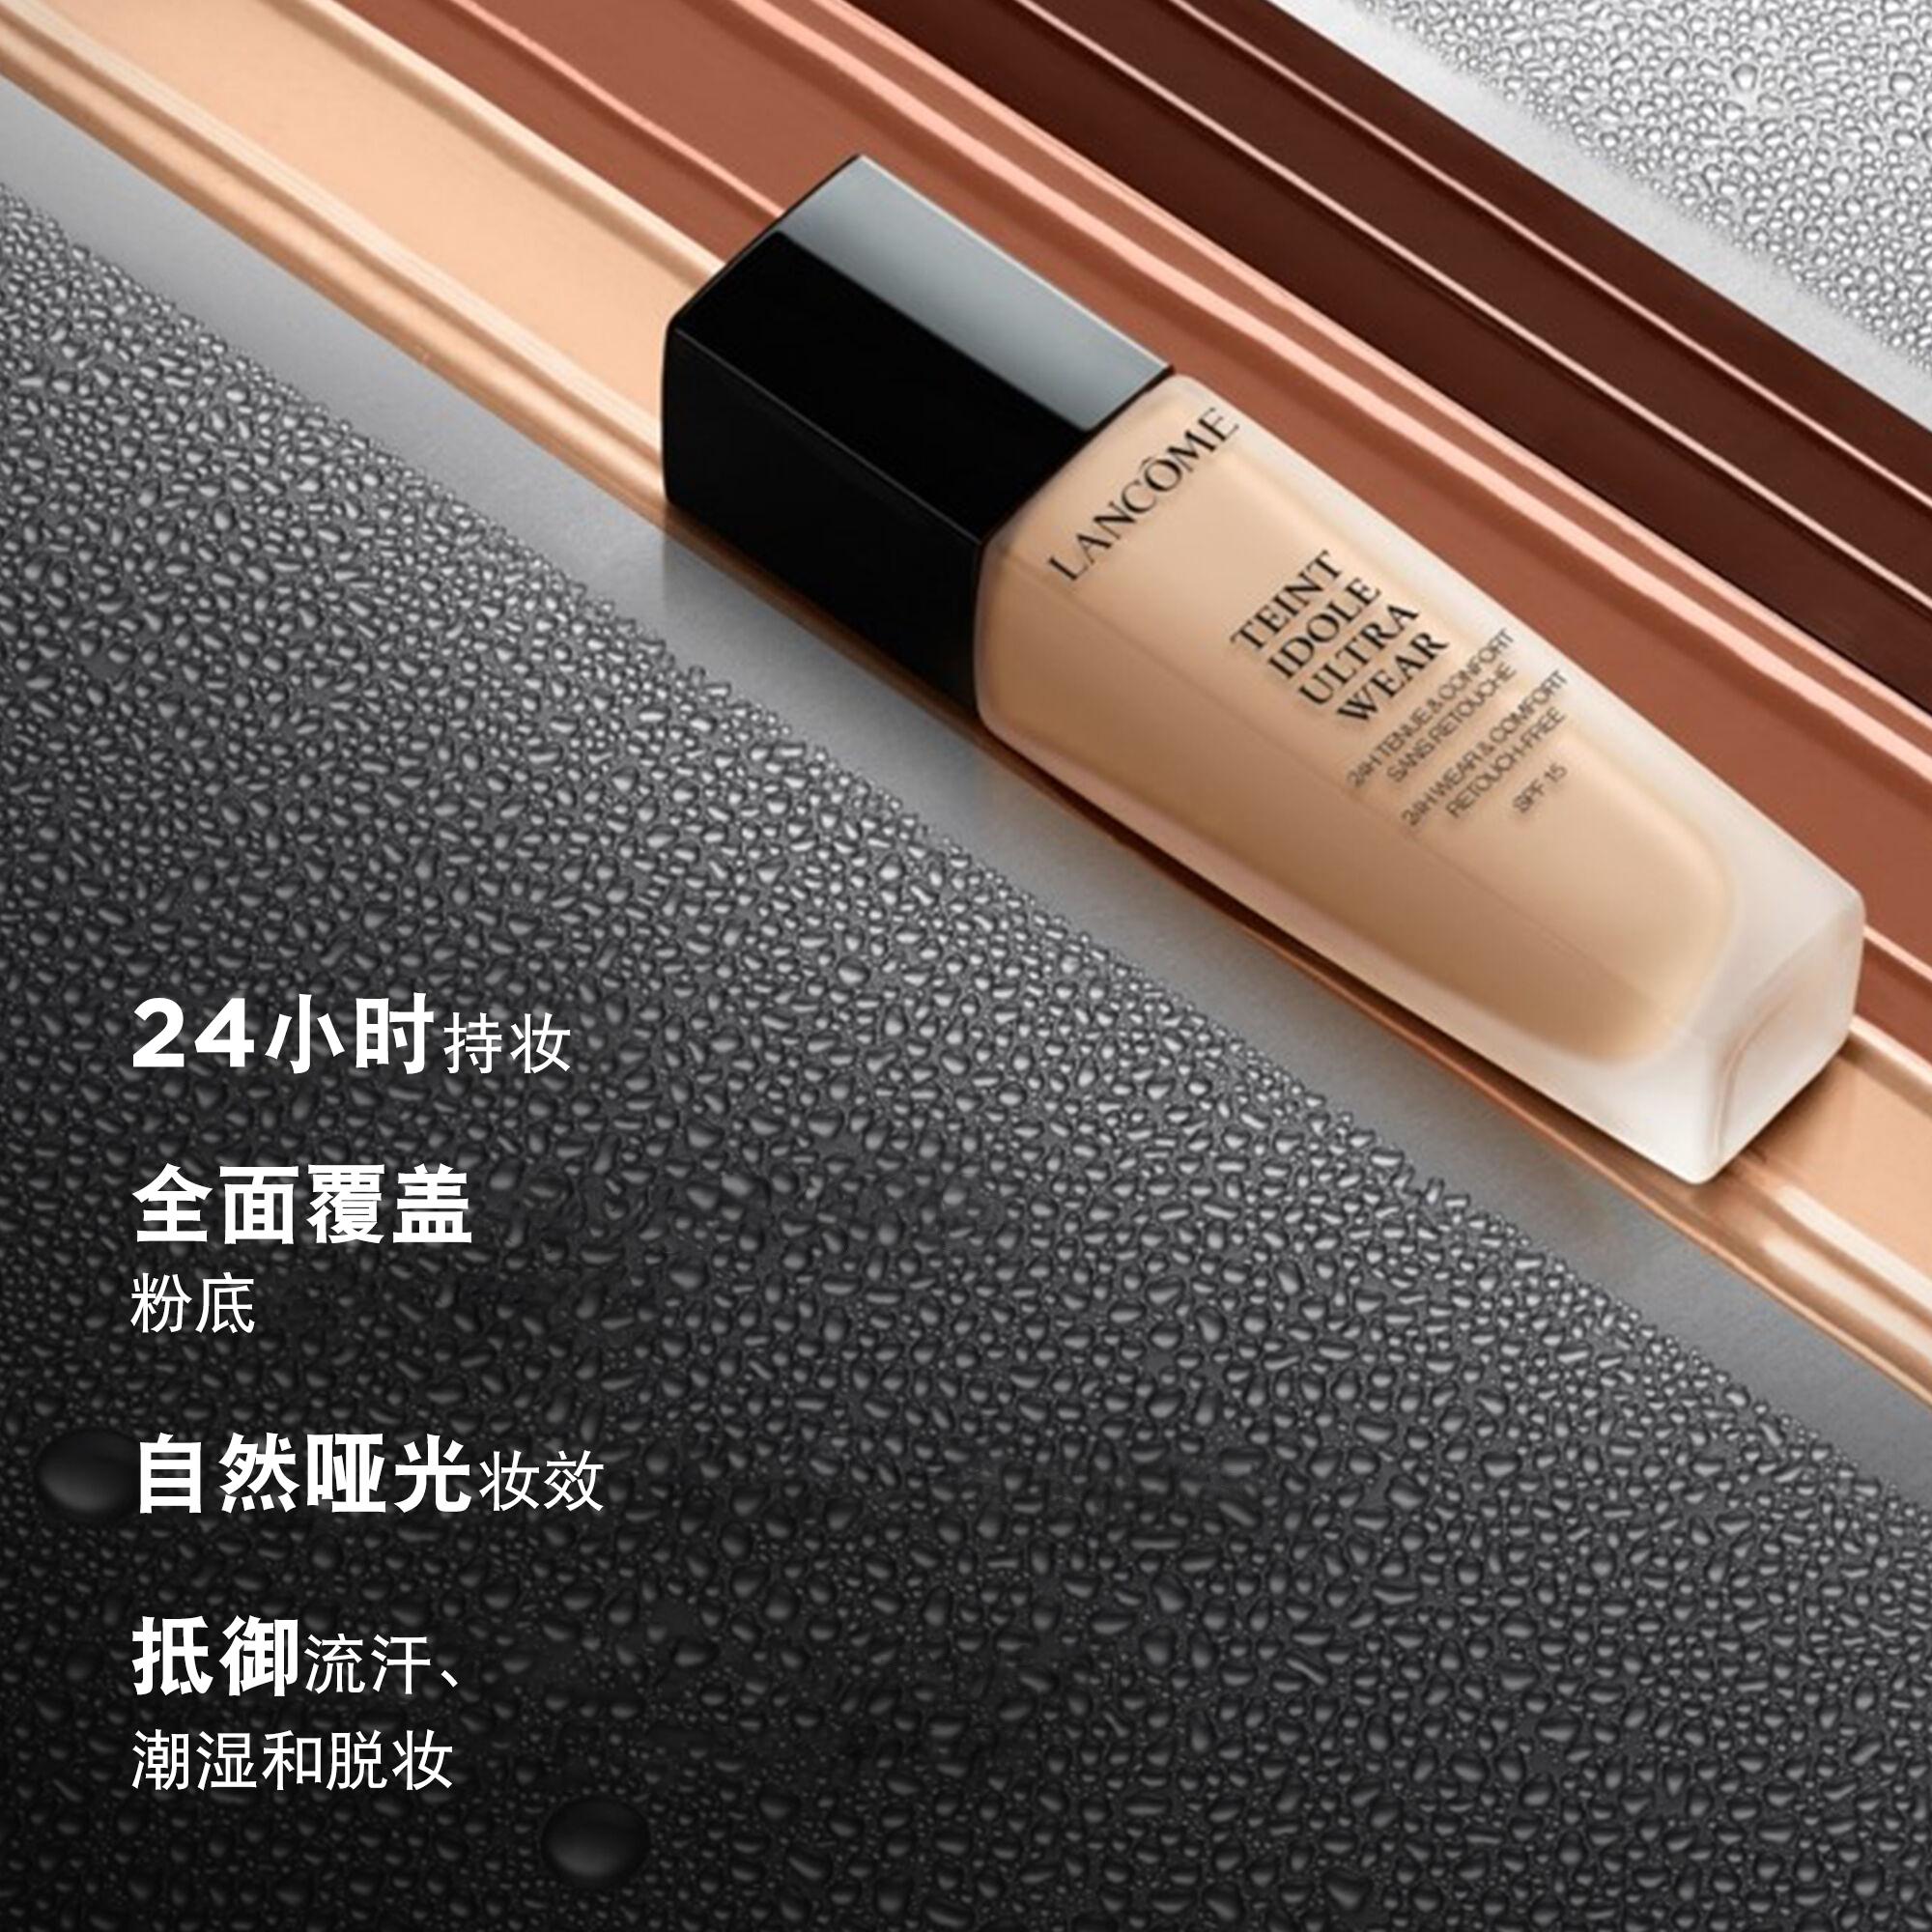 Teint Idole Ultra 24H Long Wear Foundation(24 小时无痕舒适粉底液)